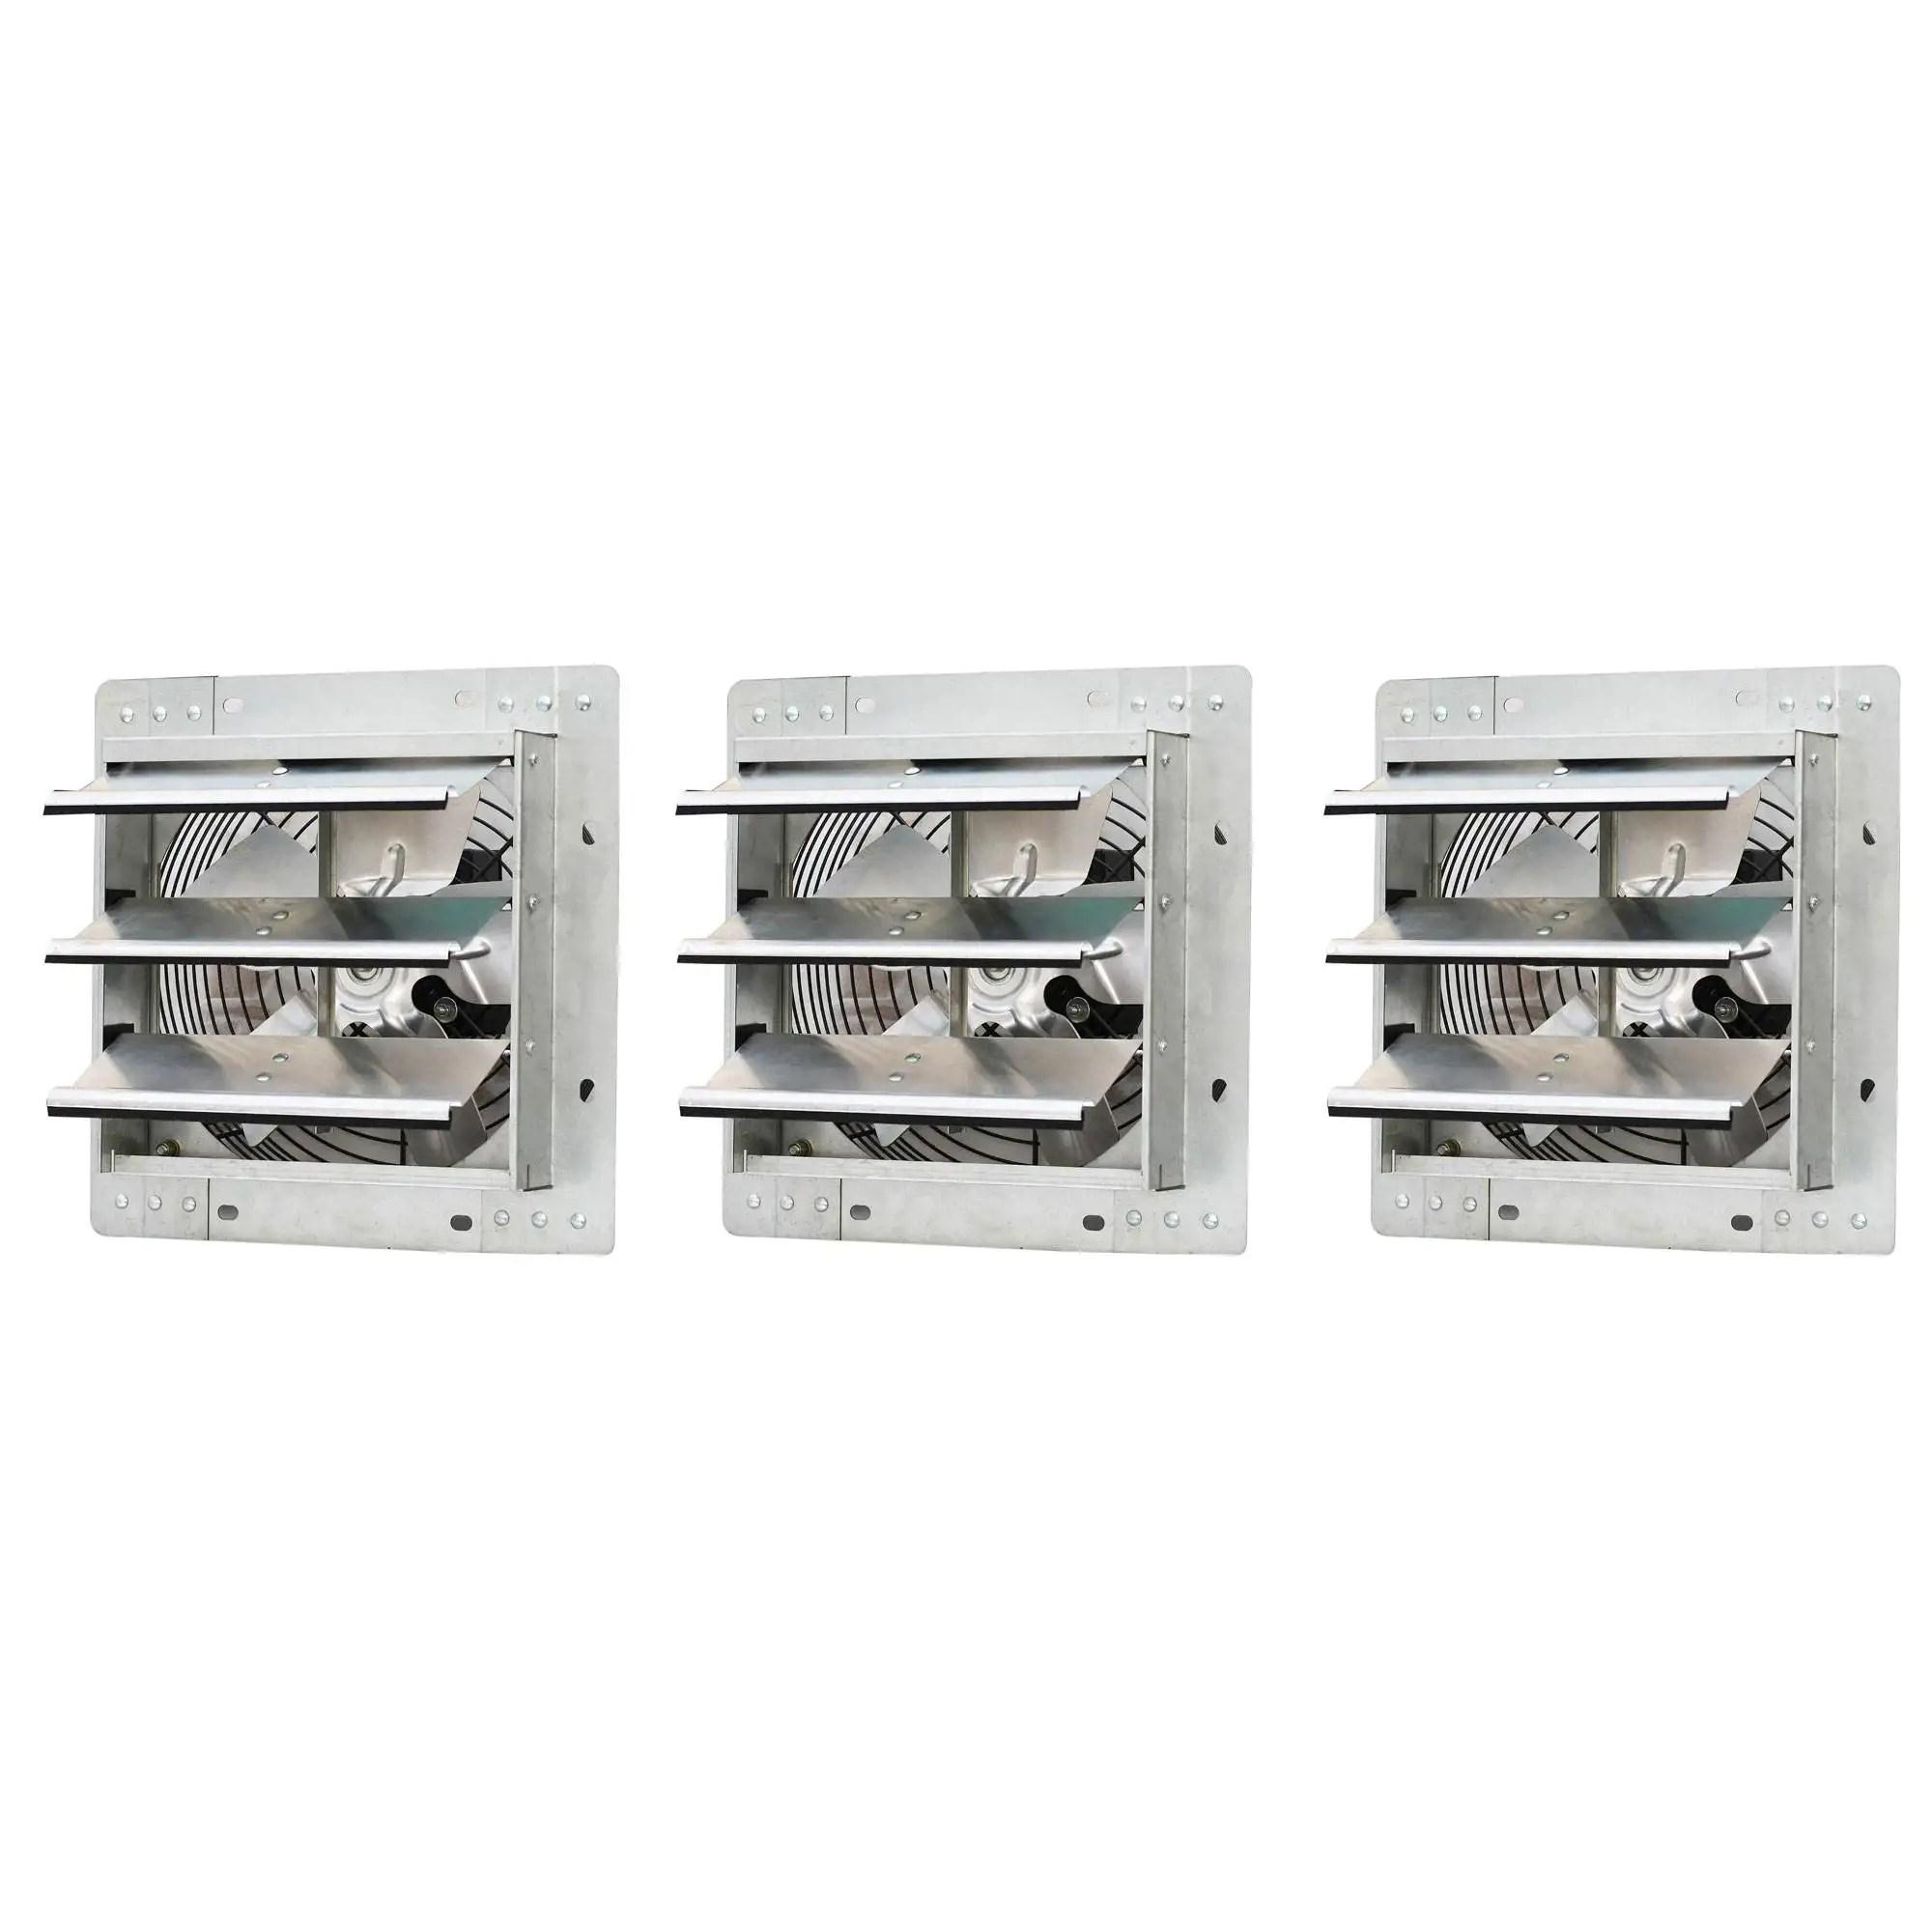 iliving 10 wall mounted shutter exhaust fan 3 pack